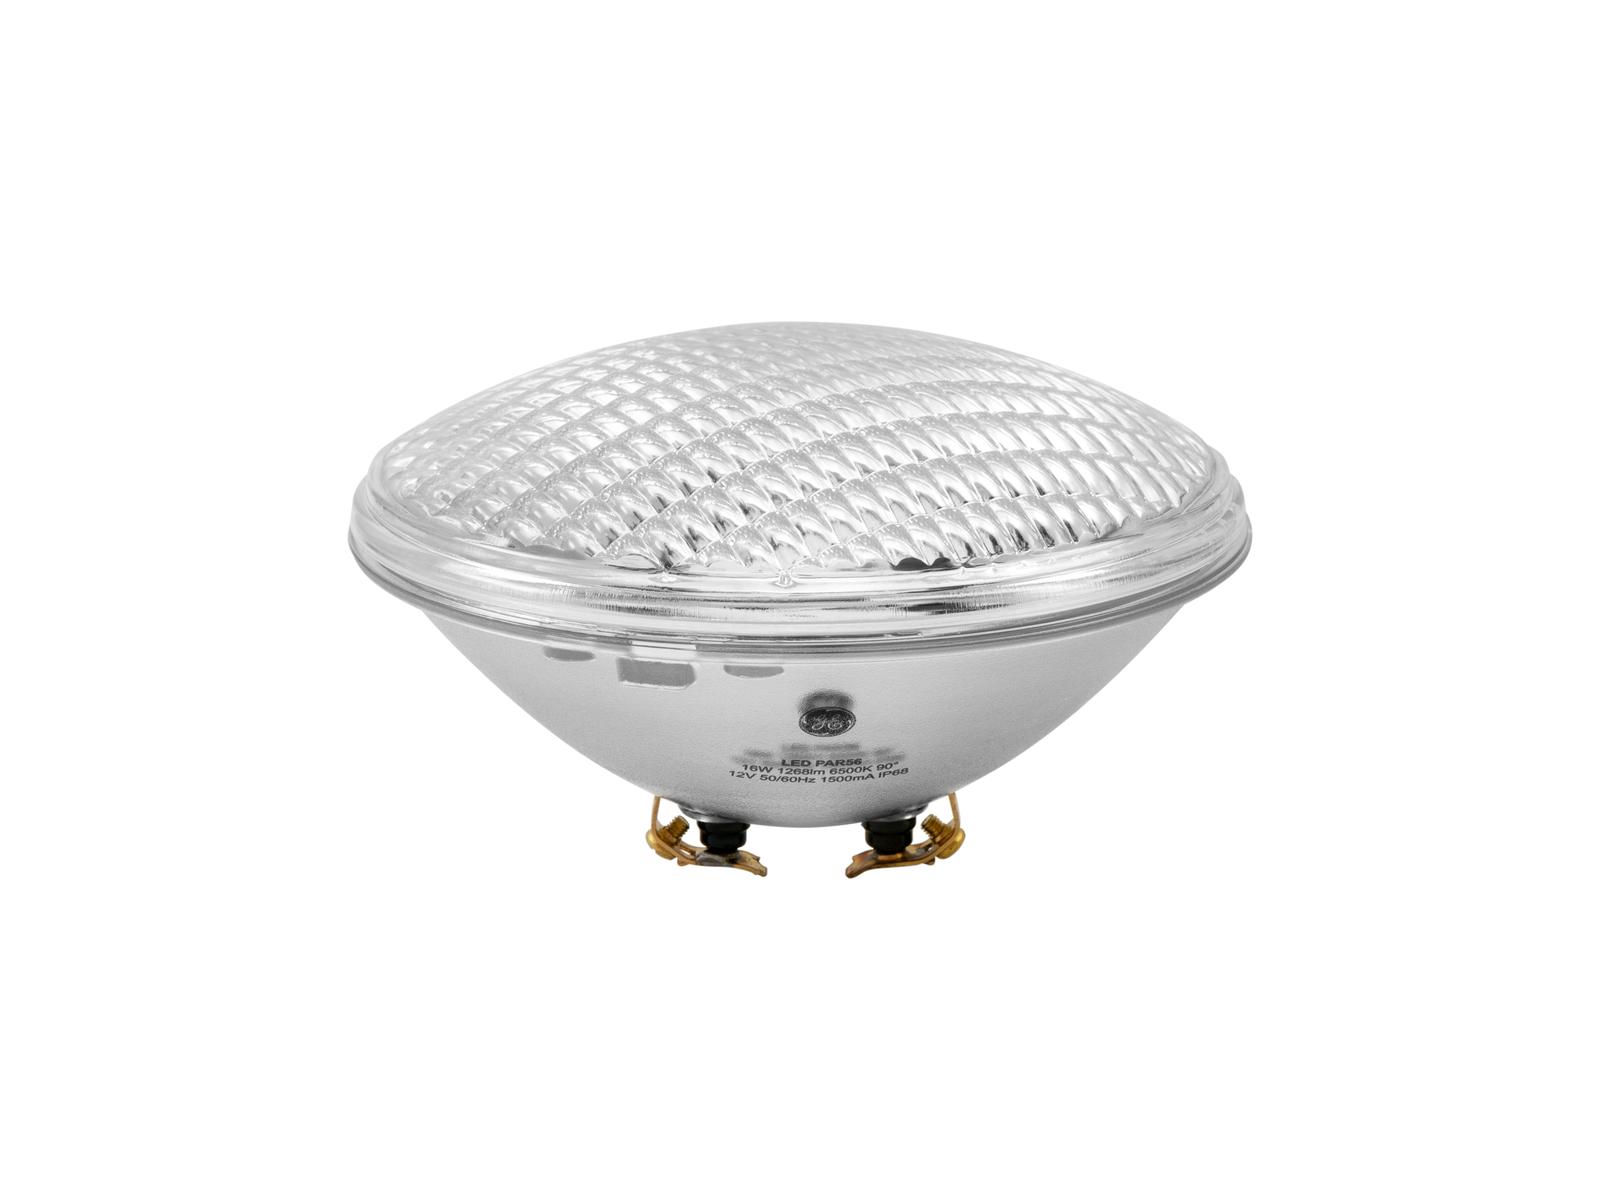 TUNGSRAM PAR-56 12V/16W 6500K LED-Schwimmbadlampe